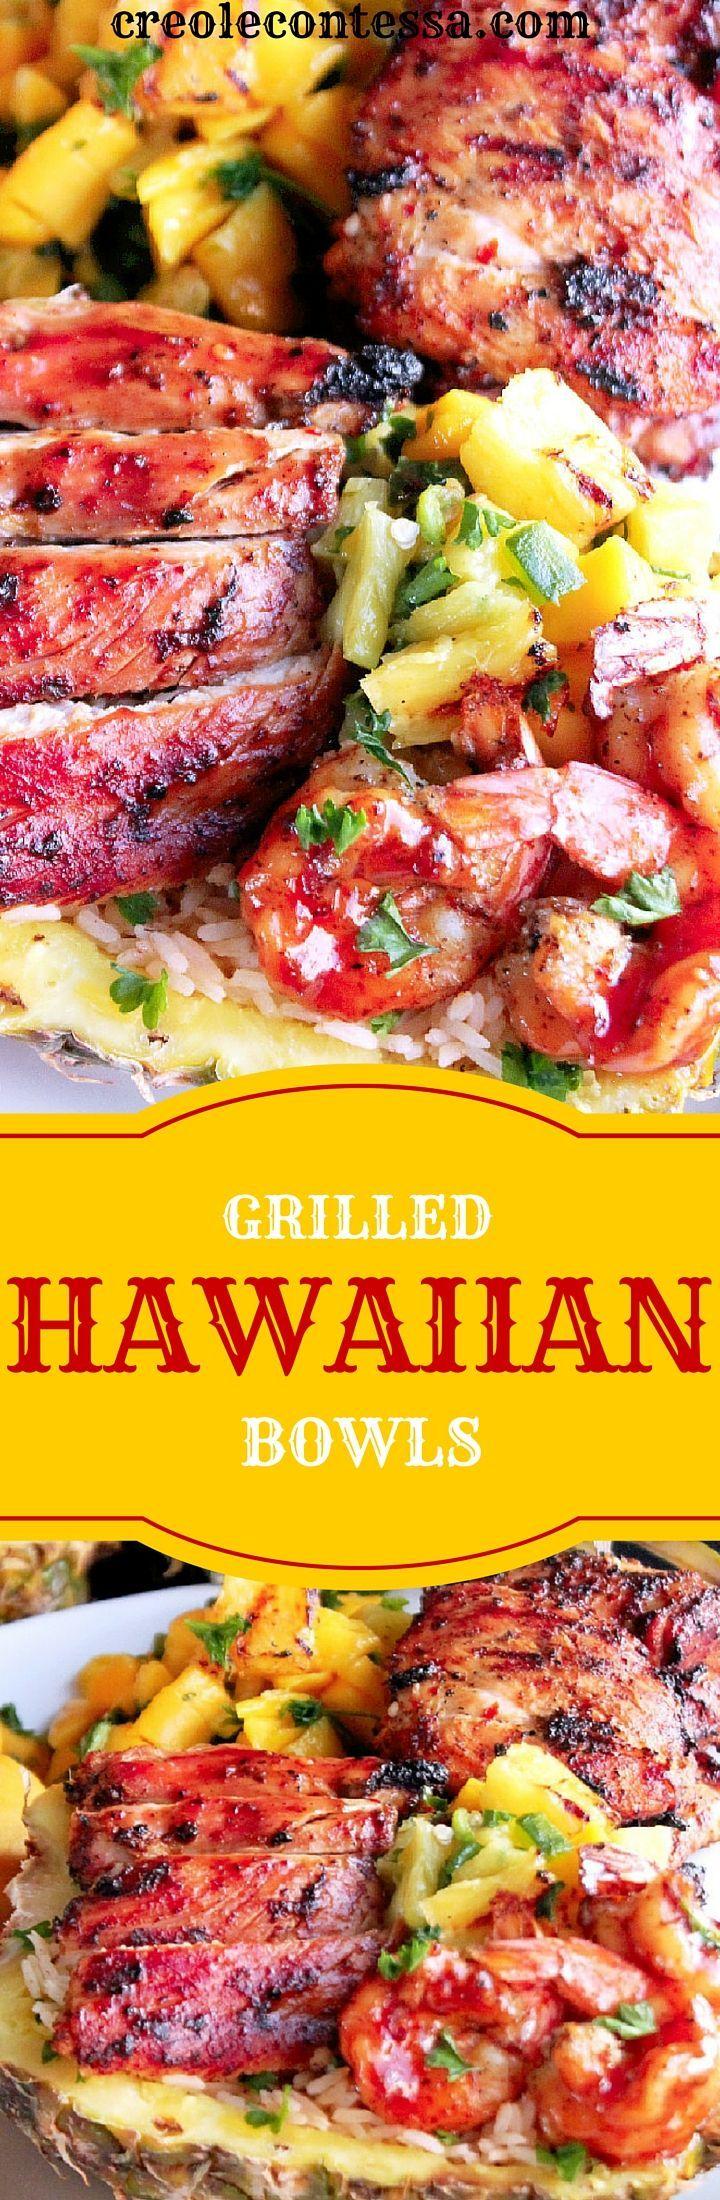 Grilled Chicken and Shrimp Hawaiian Bowls-Creole Contessa #ad #kikkoman #sheknows